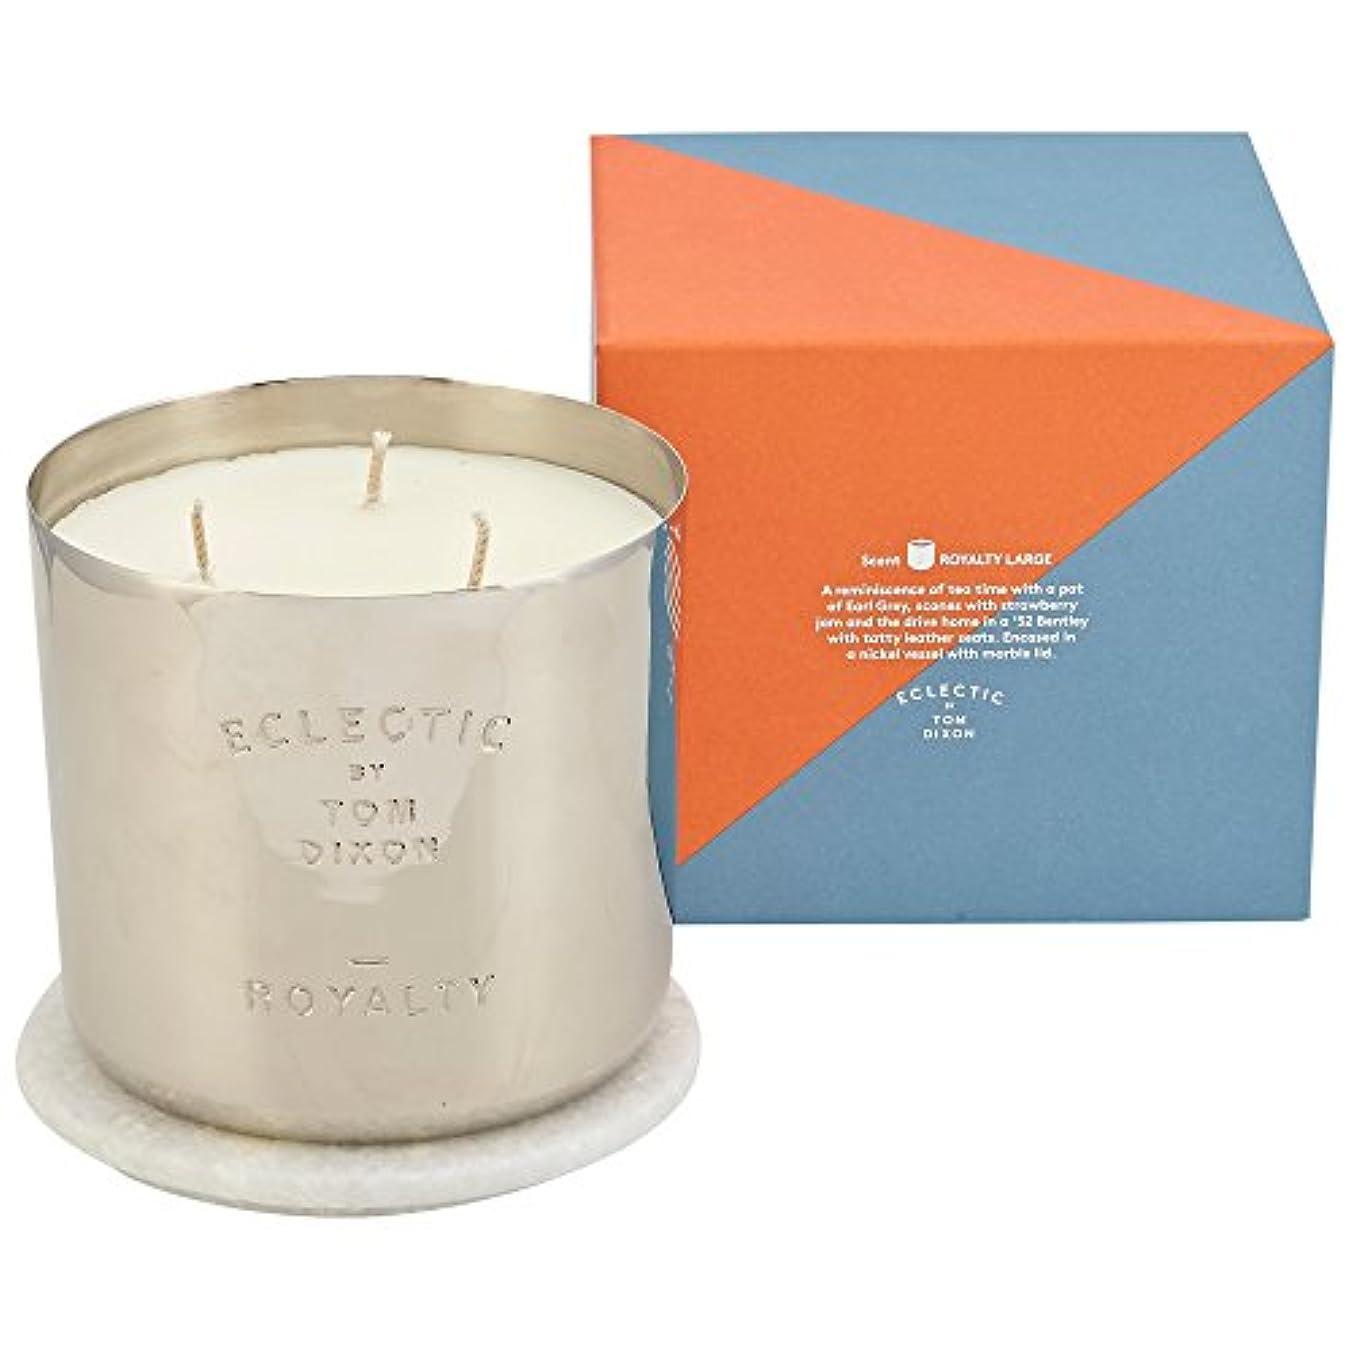 Tom Dixon Royalty Scented Candle Large (Pack of 2) - トムディクソンロイヤリティ大きな香りのキャンドル x2 [並行輸入品]